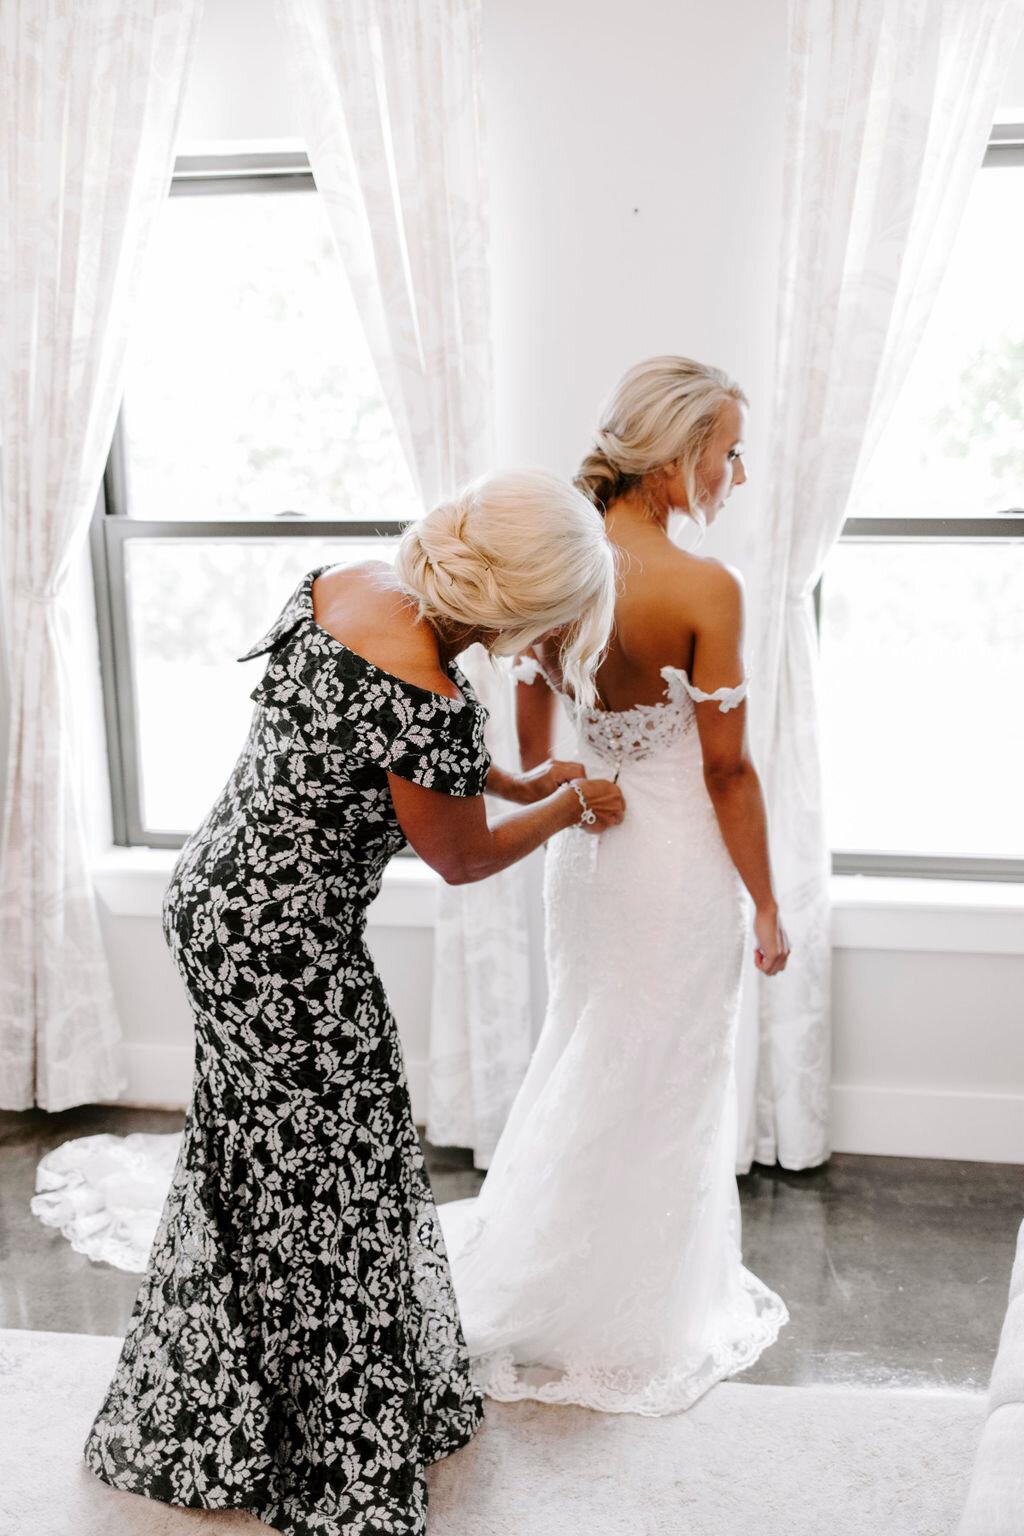 Tulsa White Barn Wedding Venue Outdoor Ceremony 28.jpg